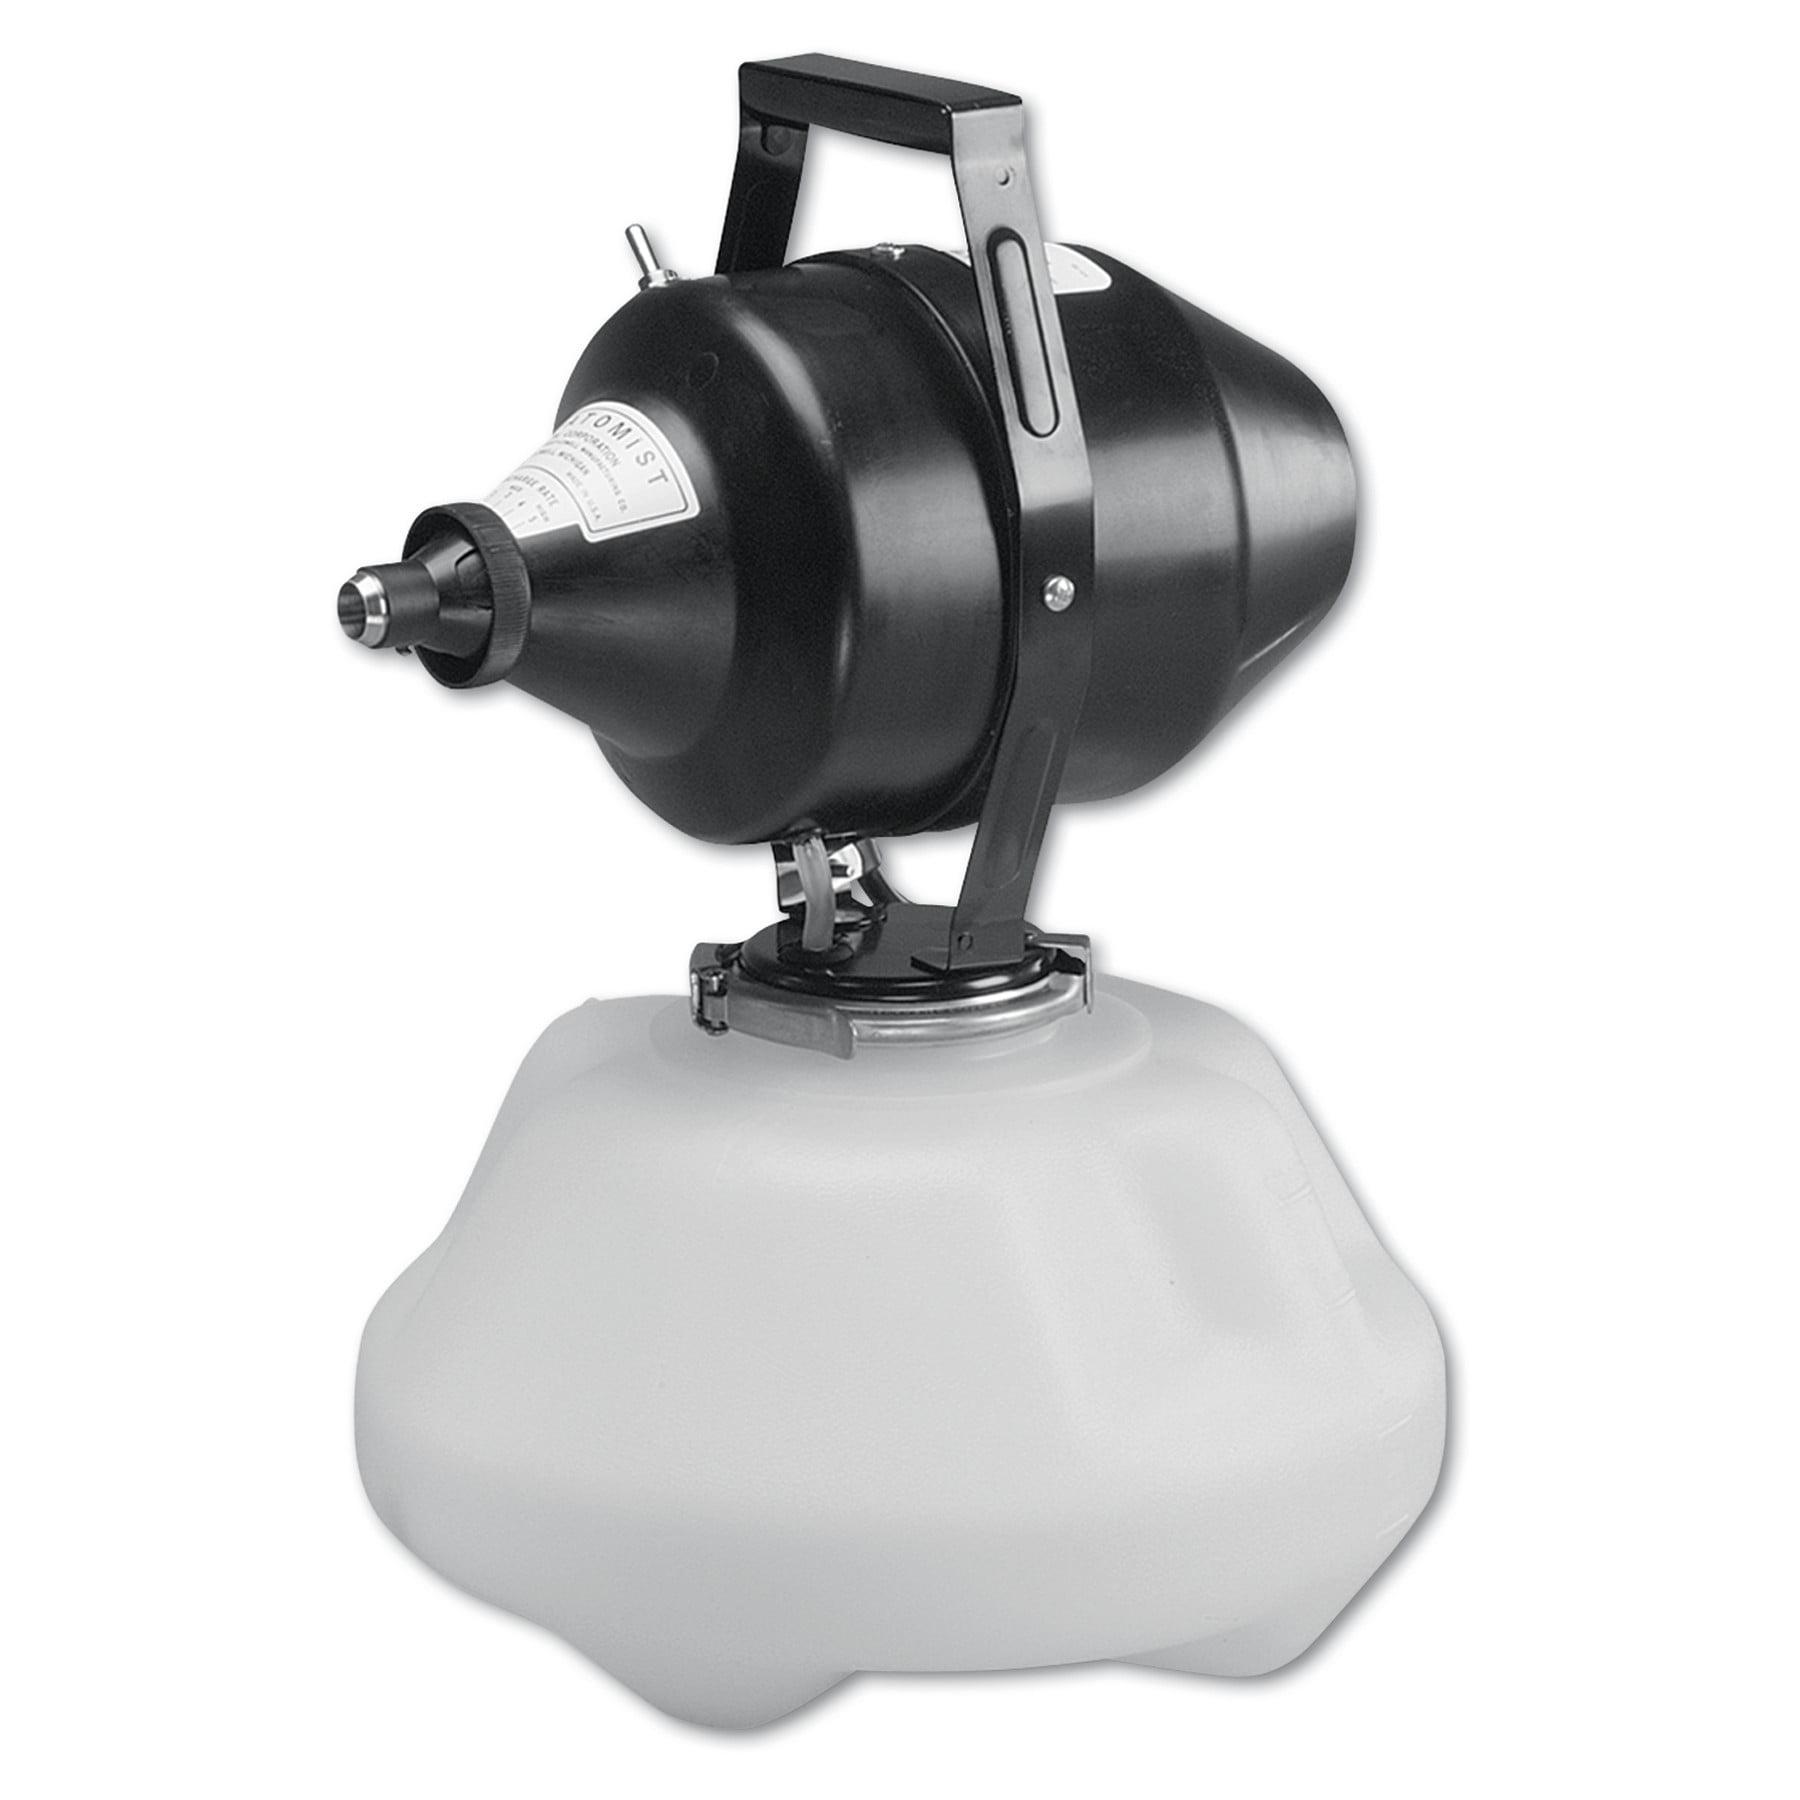 R. L. Flomaster Atomist Electric Sprayer w Nozzle, 2 Gal, Polyethylene, Black Translucent... by RL FLOMASTER